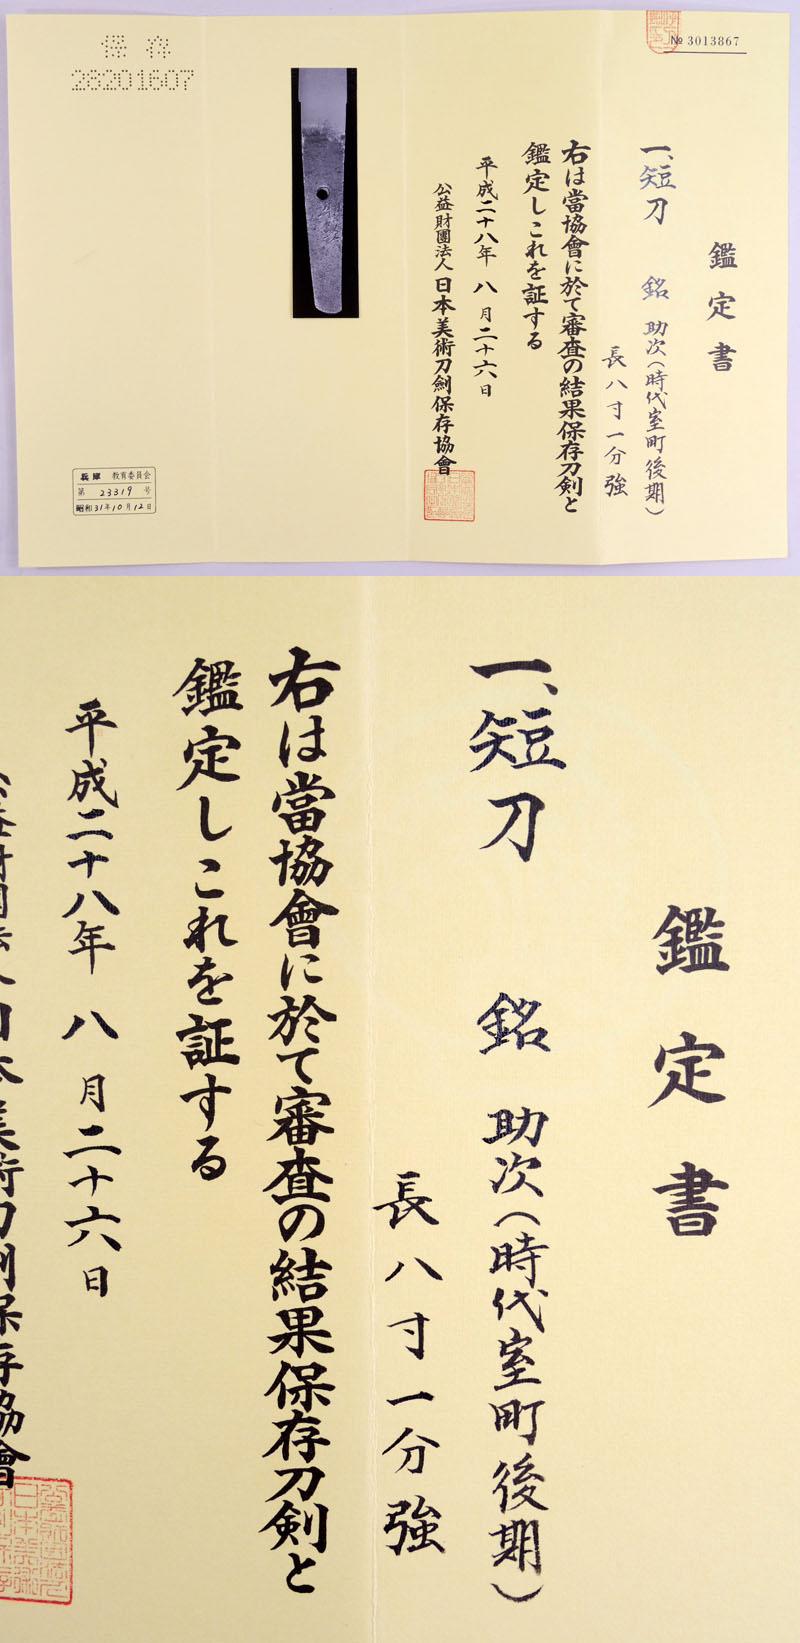 助次(時代室町後期) Picture of Certificate